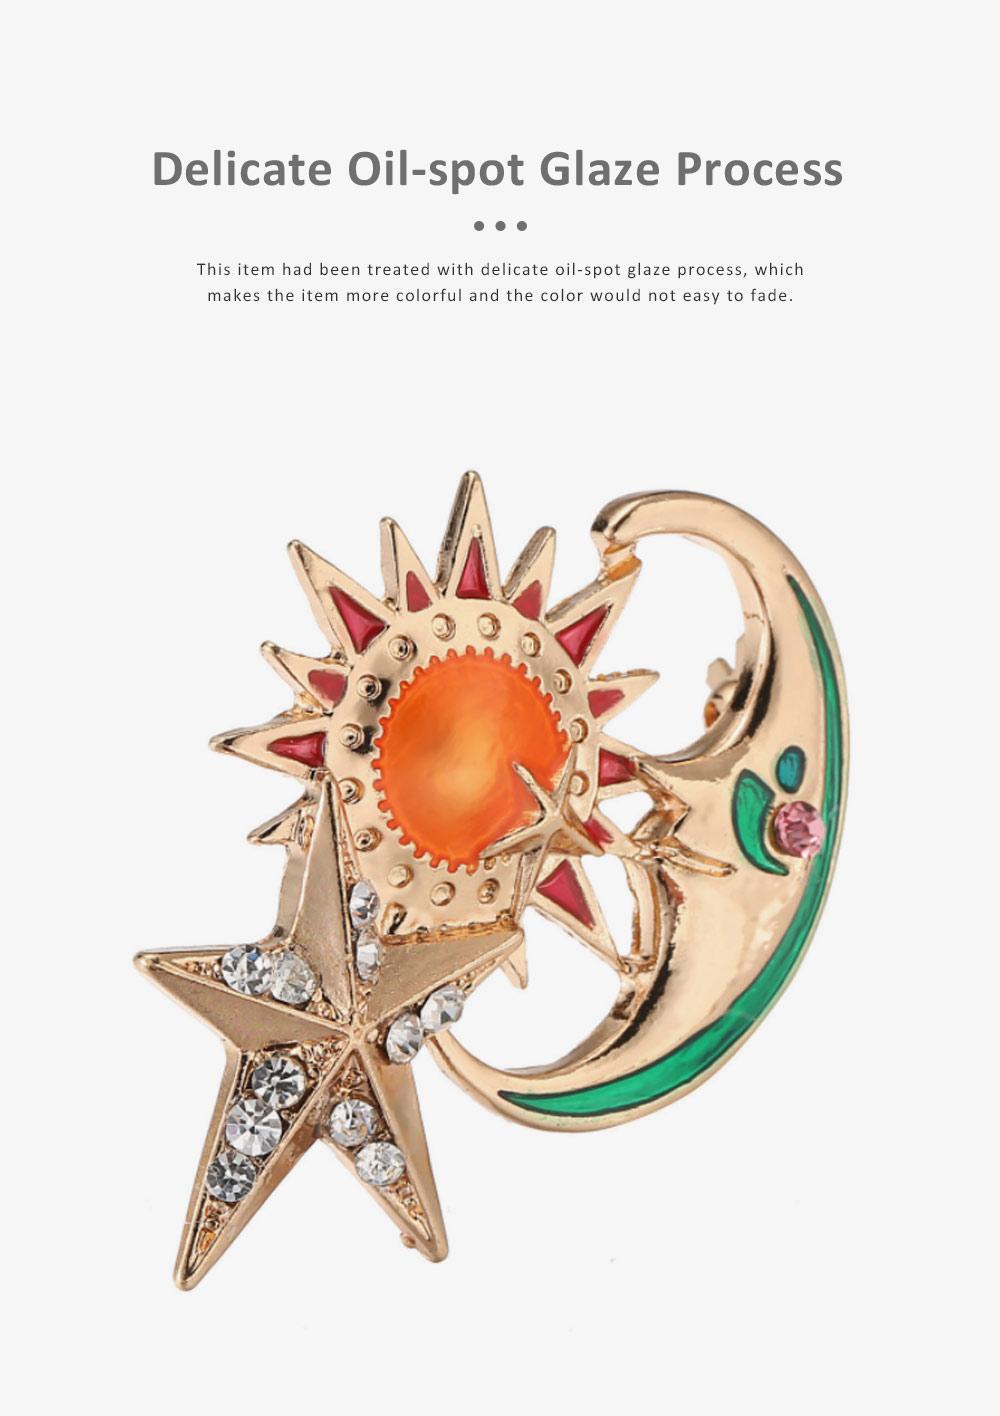 Sun Star Moon Breastpin, Fancy Delicate Shiny Alloy Brooch Scarf Ornament Oil-spot Glaze Rhinestone Decoration Brooch 2